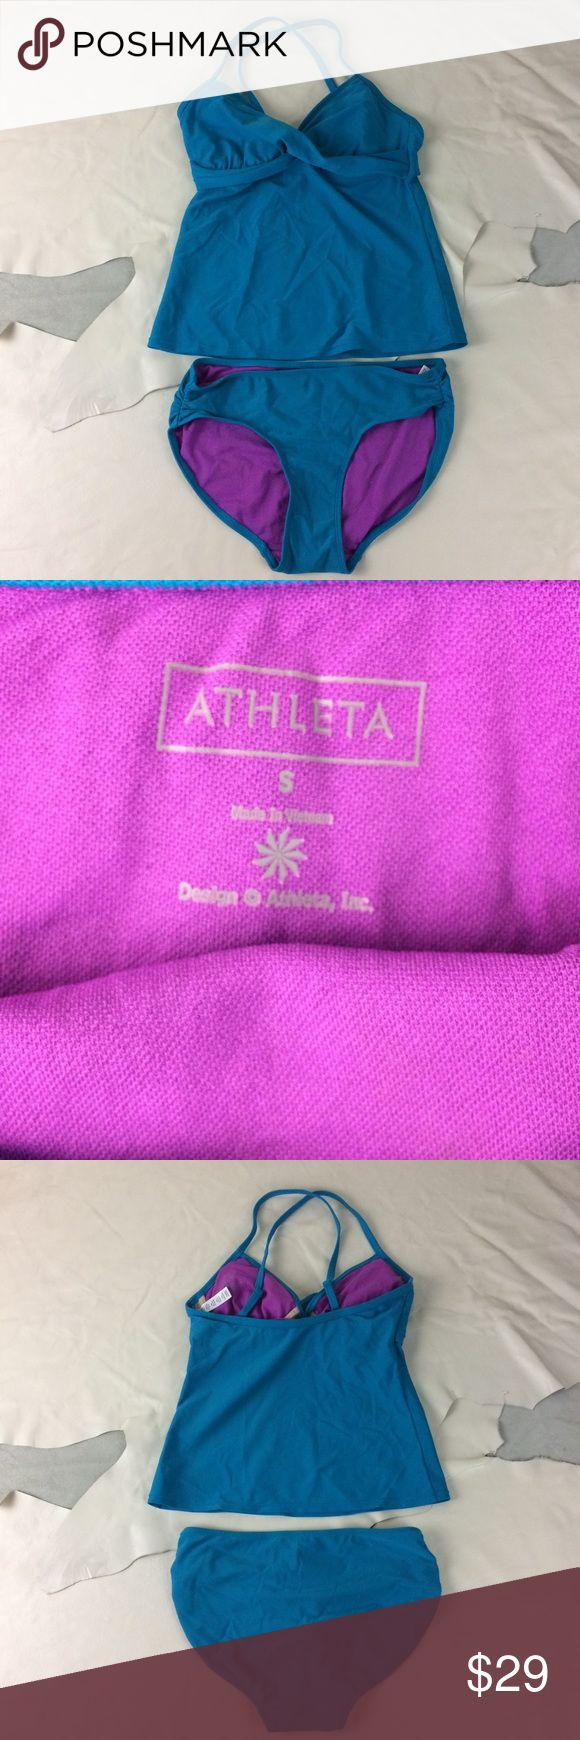 Athleta Swim 2 pc Tankini/Bikini Teal & Plum S Teal & purple Athleta 3 pc swimsuit. Tankini top (34B/32C Tall), bikini top (34B/32C and hi cut bikini bottom (S) Athleta Swim Bikinis